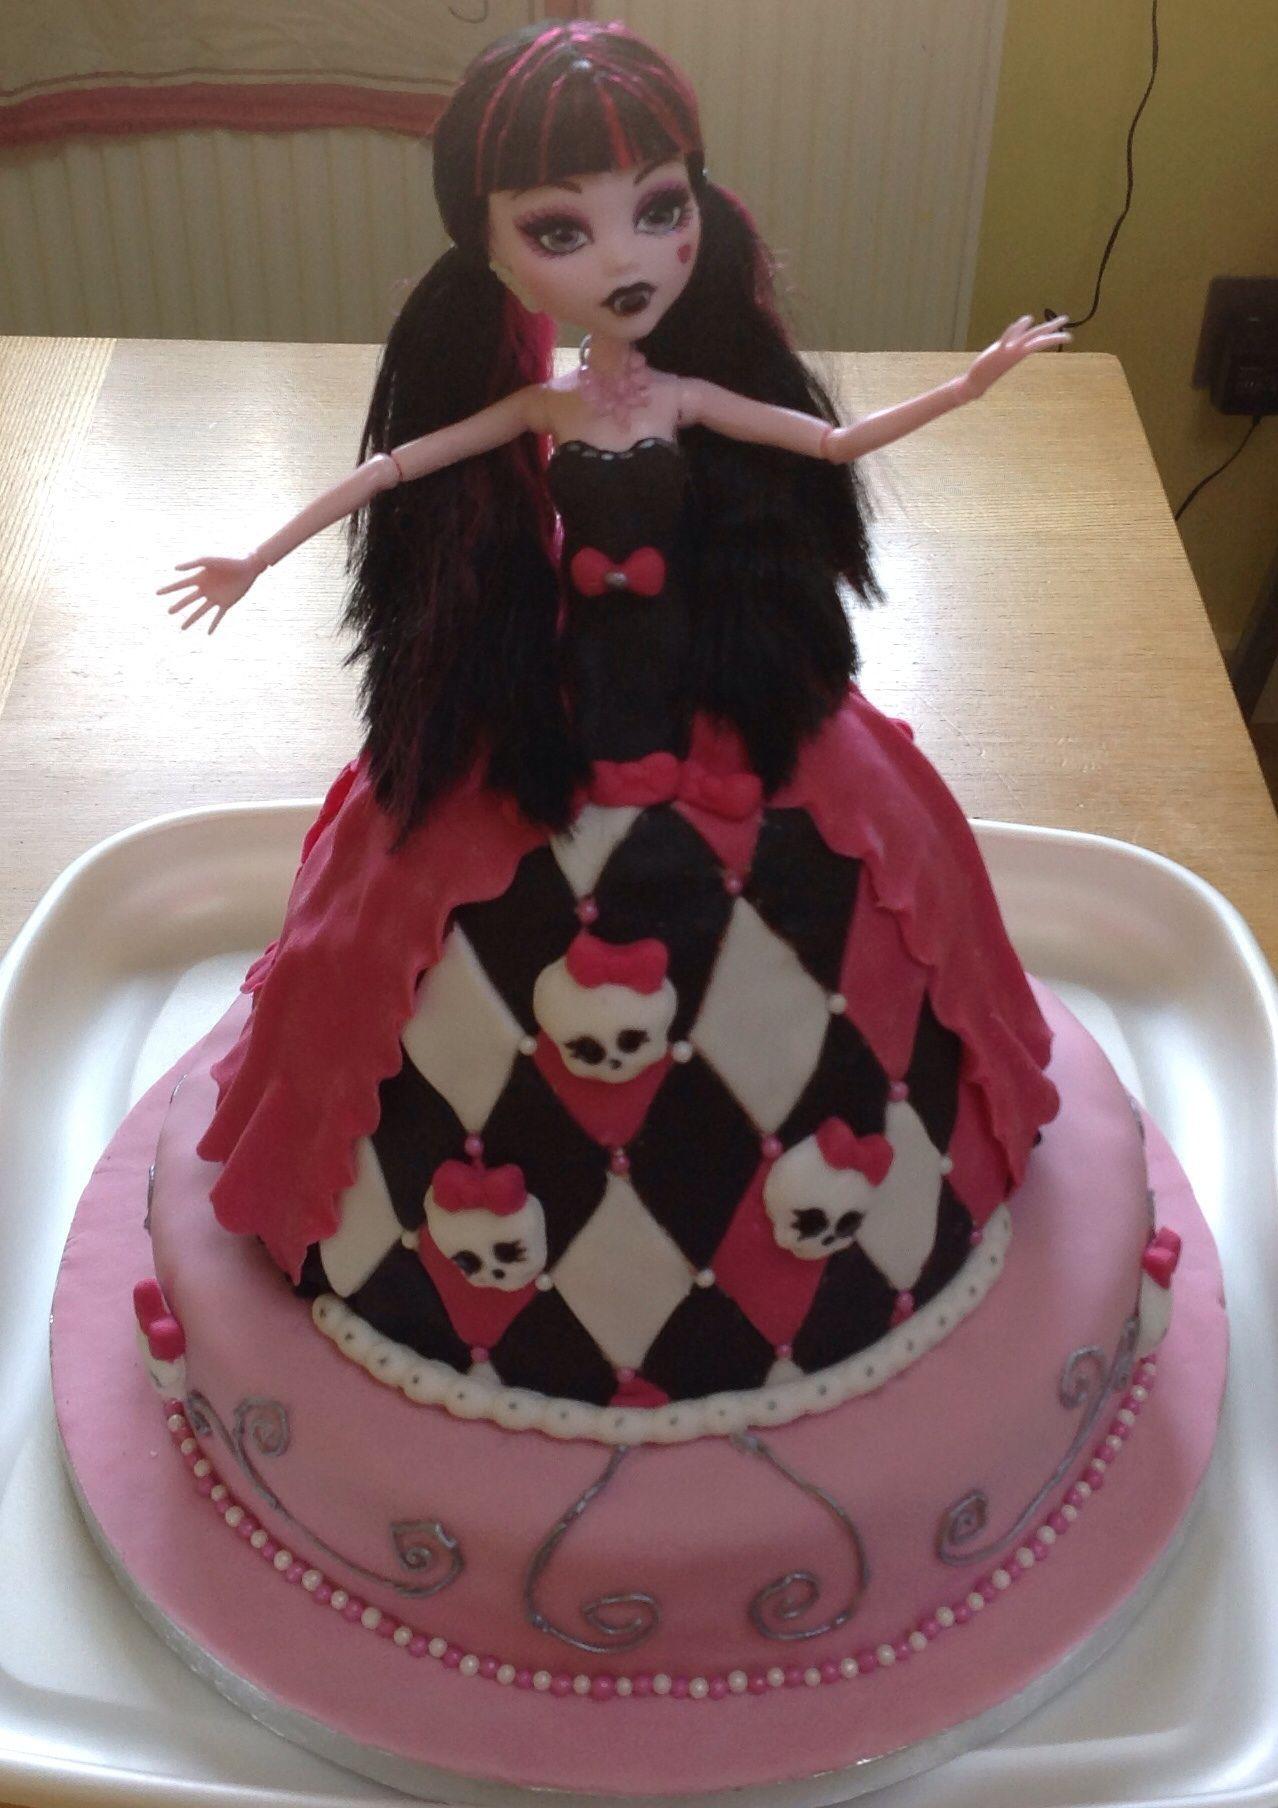 Surprising Monster High Cake Draculaura Karenscakesandbakes Co Uk Funny Birthday Cards Online Hendilapandamsfinfo